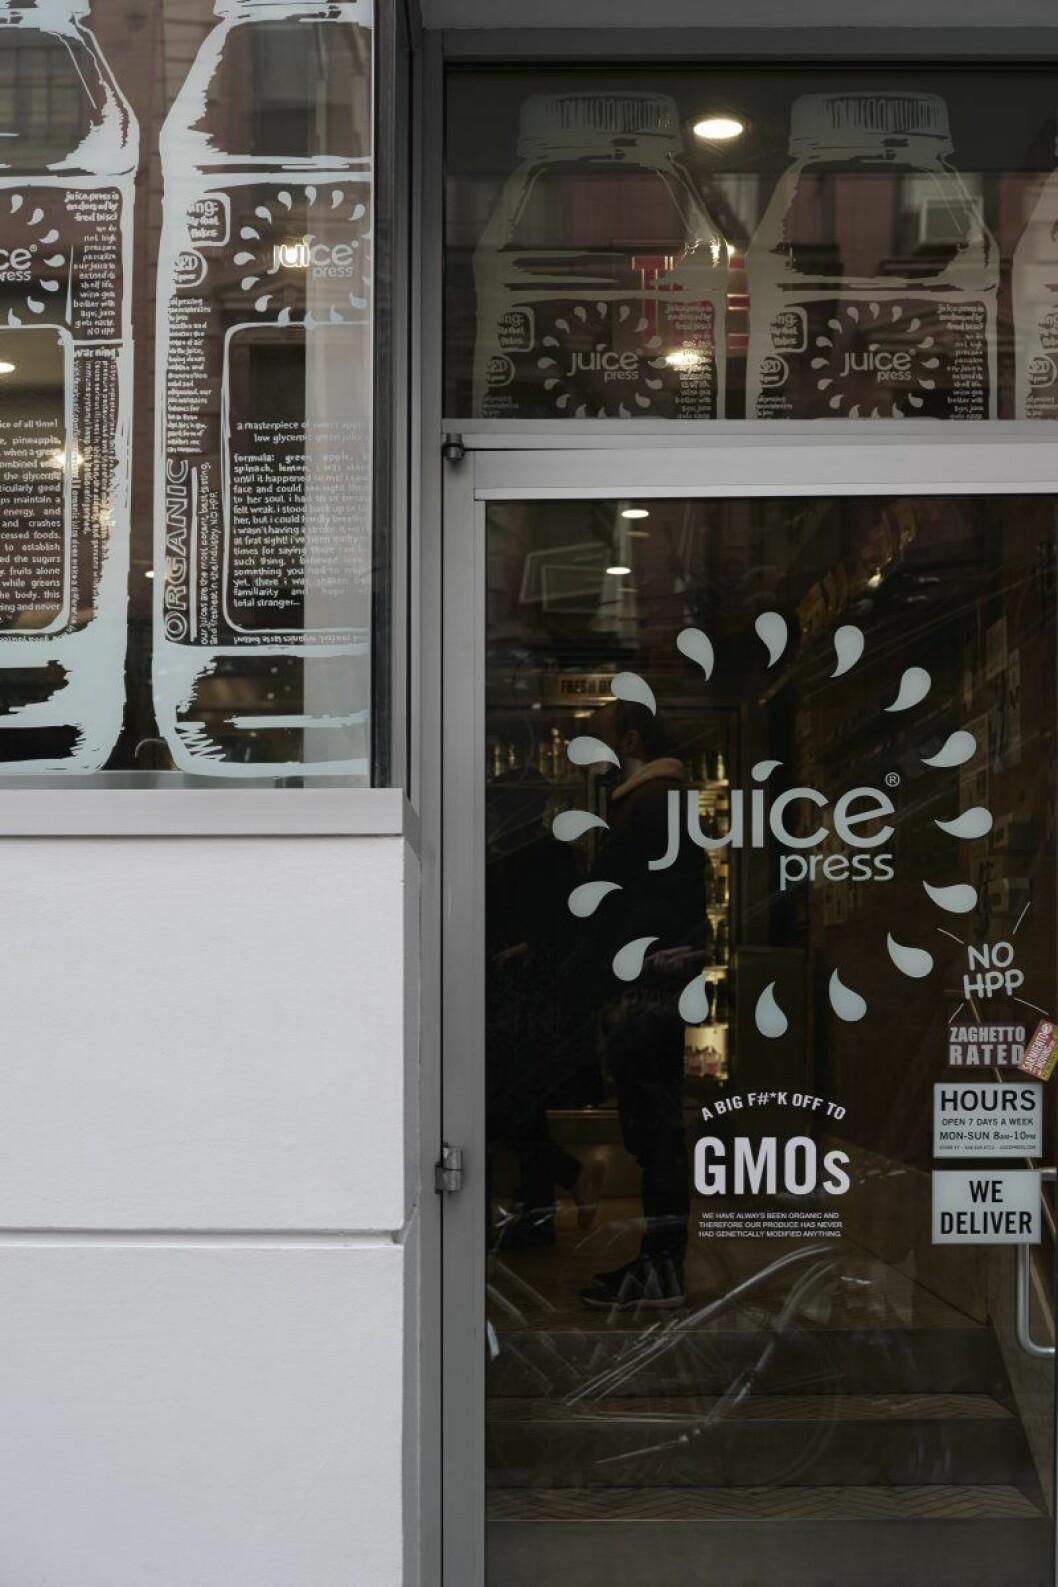 Juice press New York